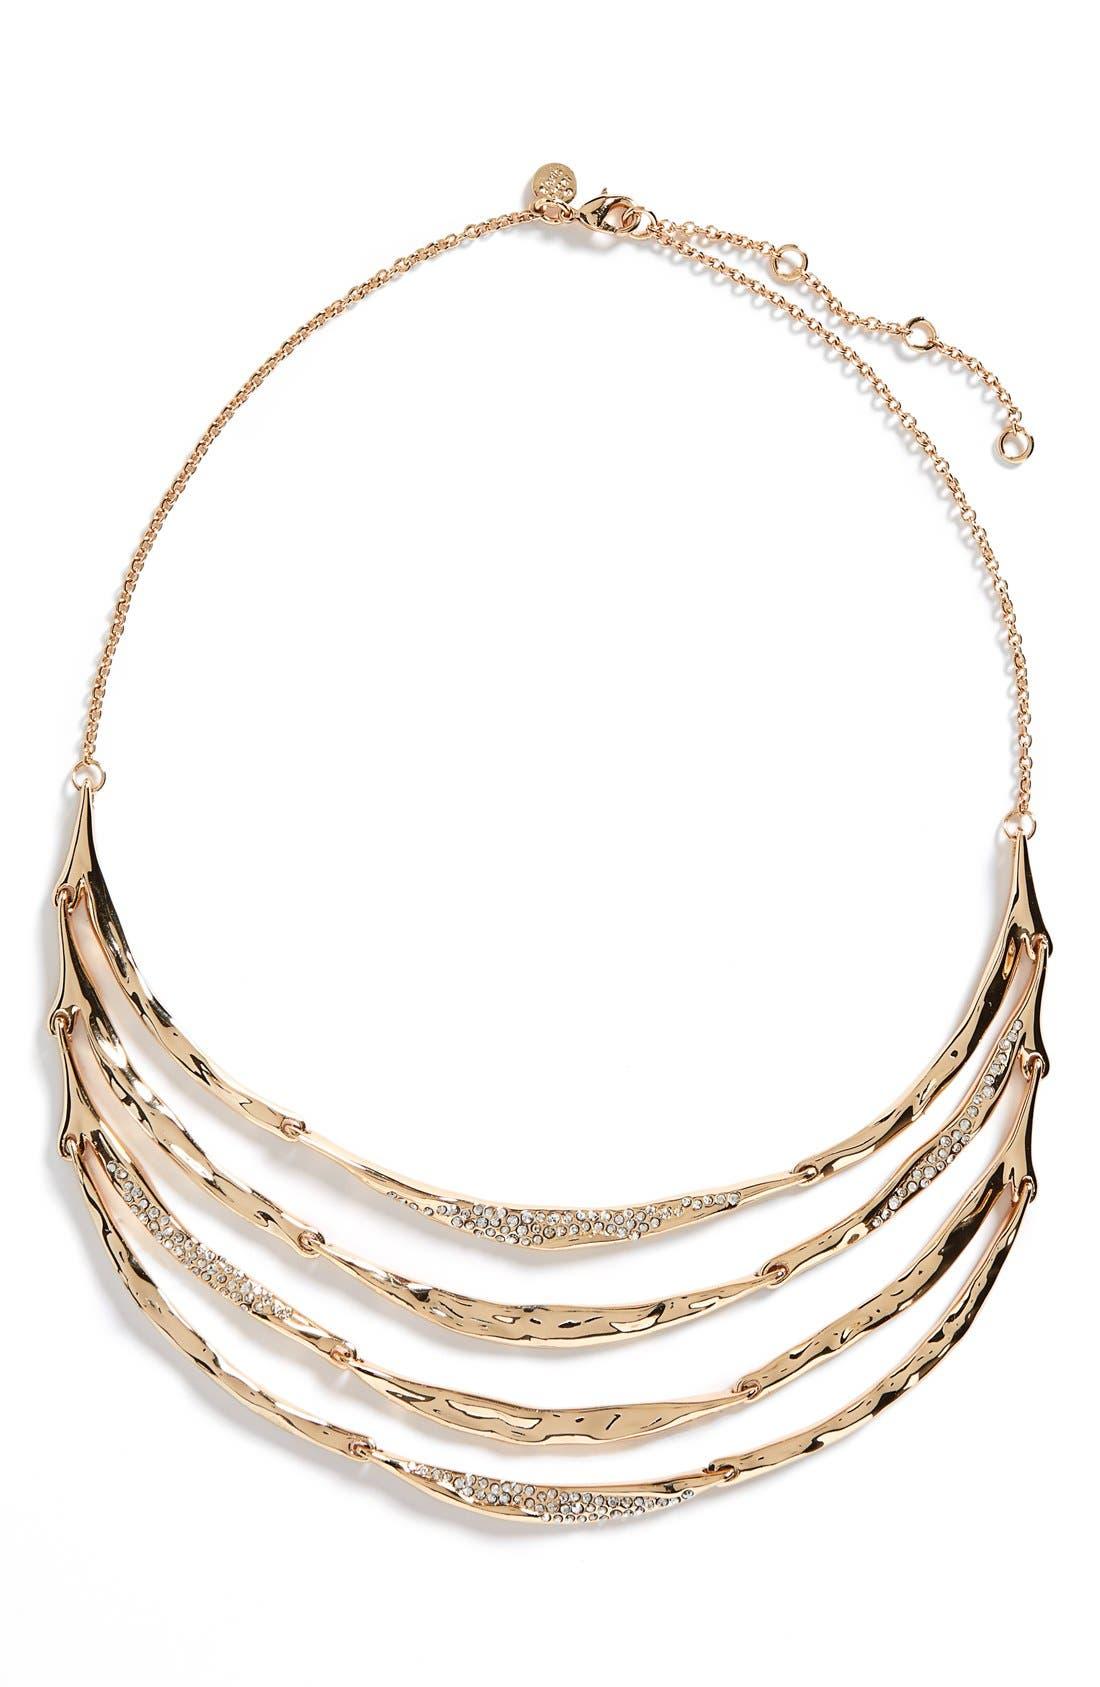 Alternate Image 1 Selected - Miss Havisham - Liquid' Tiered Bib Necklace